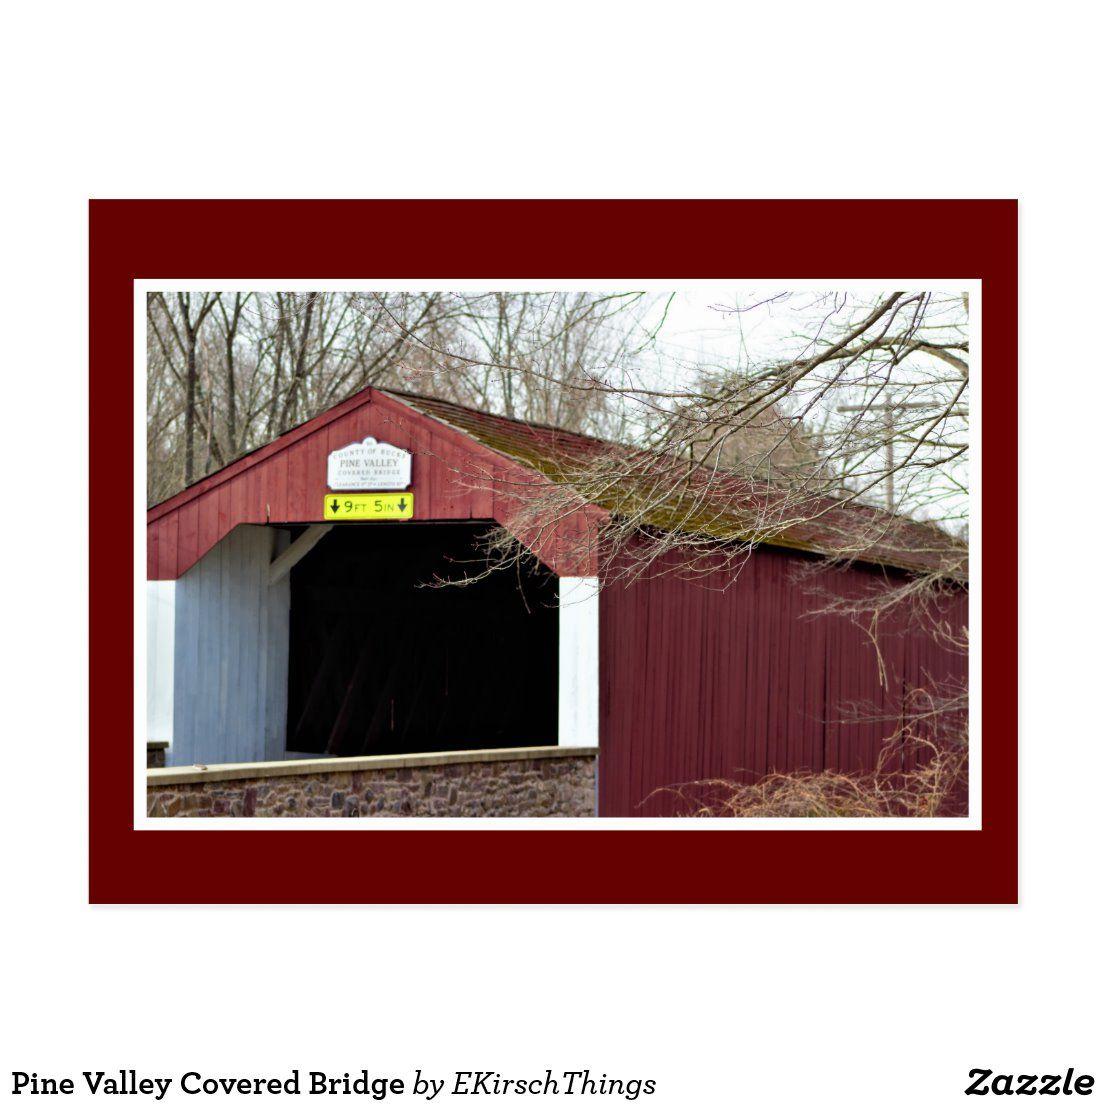 Pine Valley Covered Bridge Postcard | Zazzle.com in 2020 ...